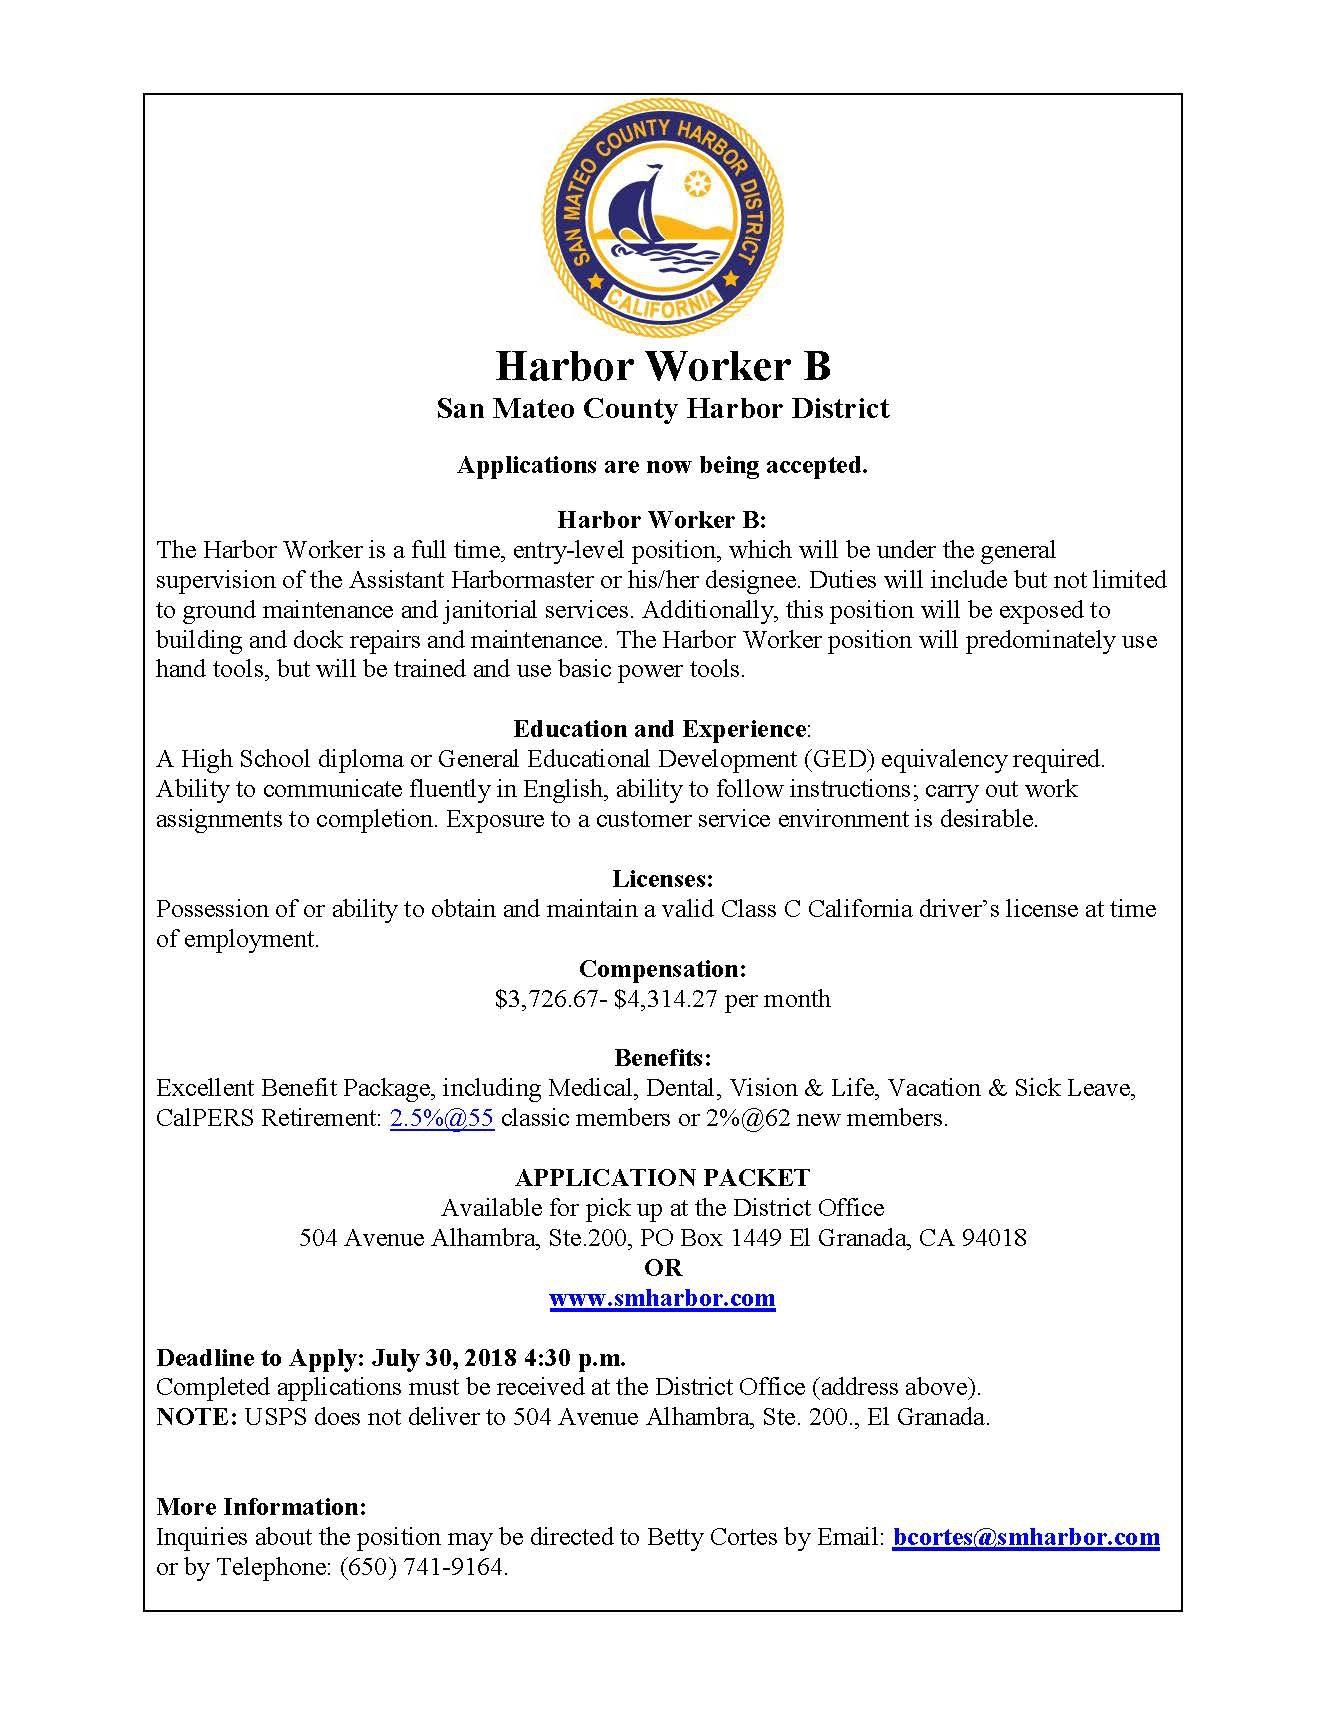 job posting harbor worker b application deadline july 30 2018